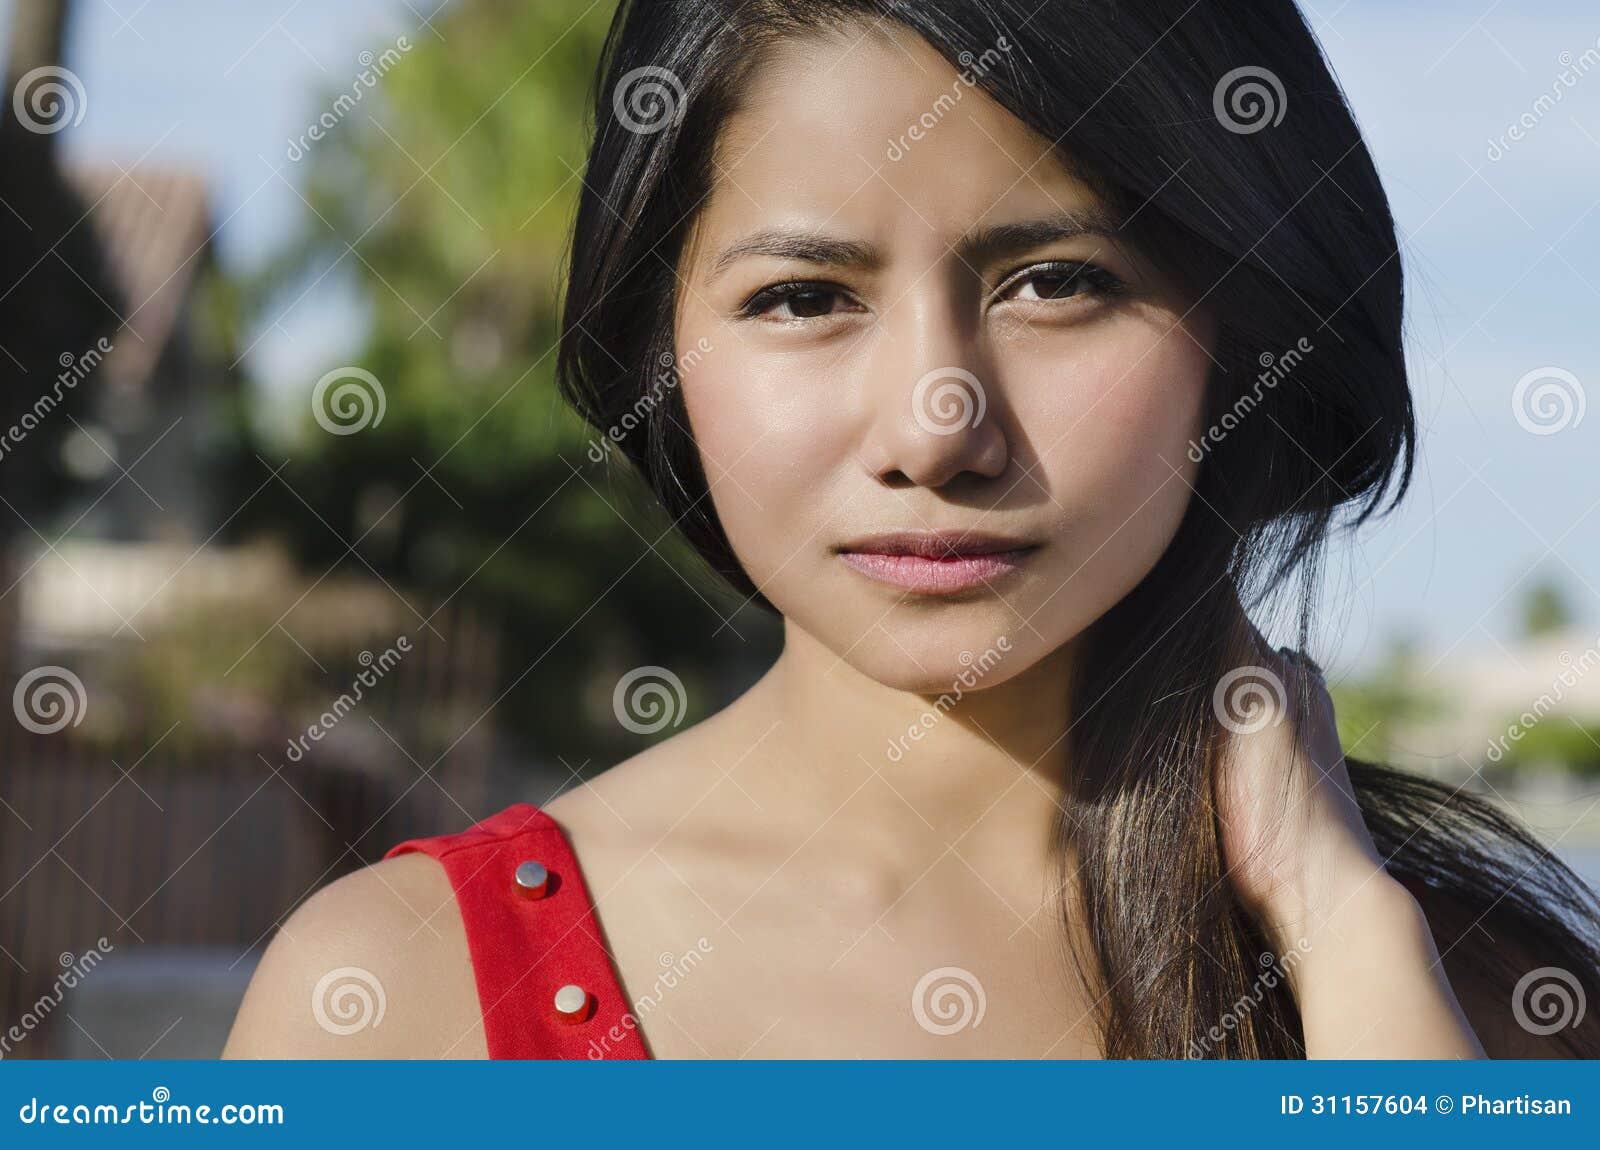 Asian Woman Faced 16